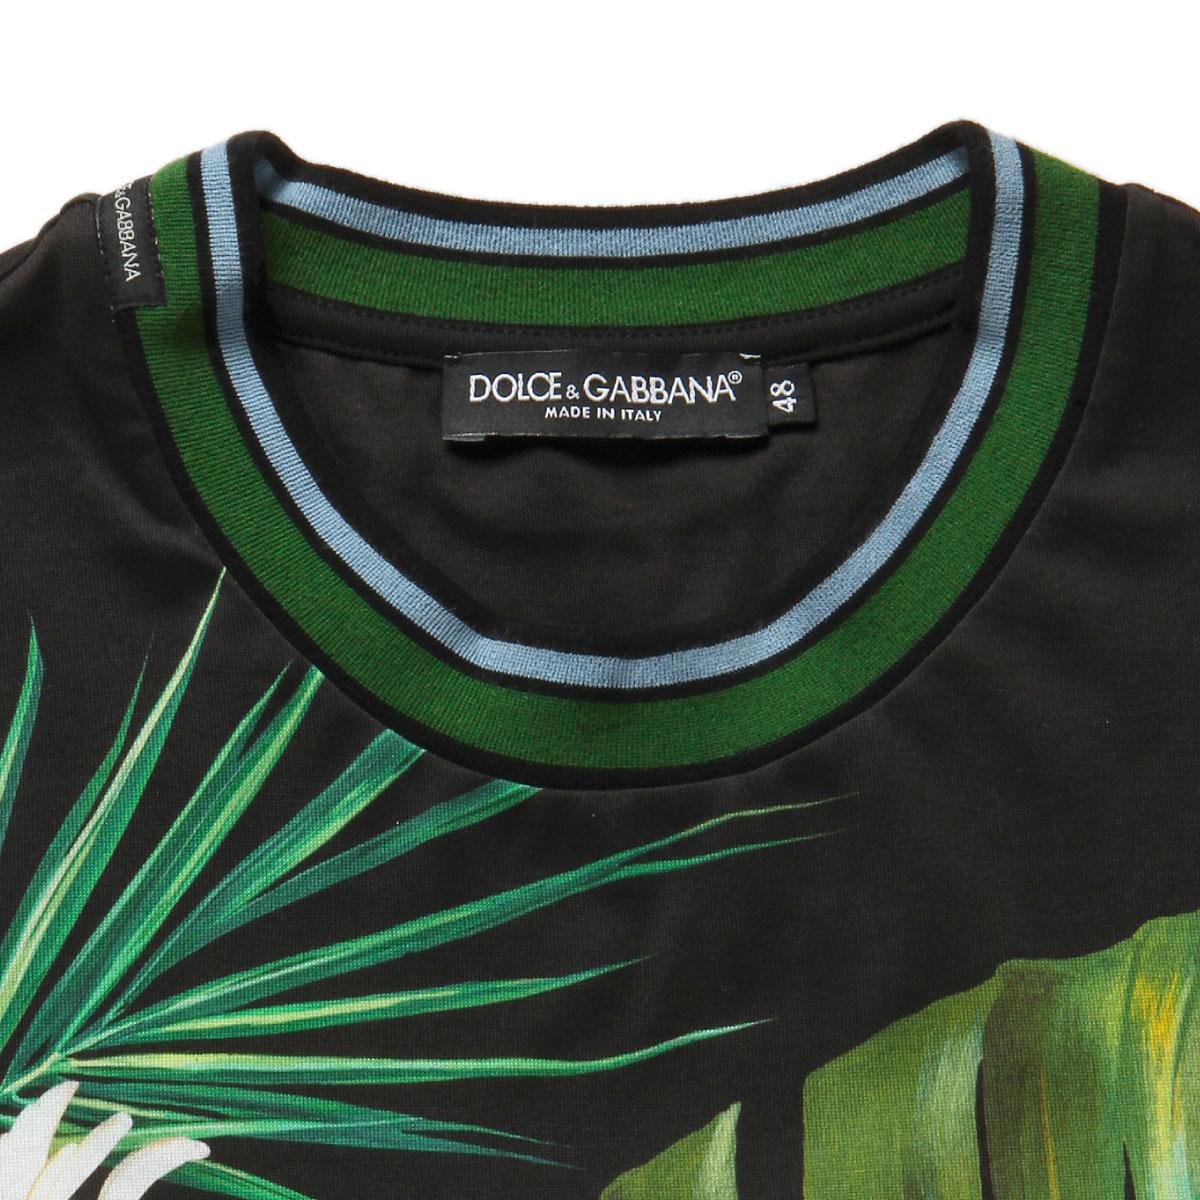 DOLCE&GABBANA ドルチェアンドガッバーナ | 半袖Tシャツ